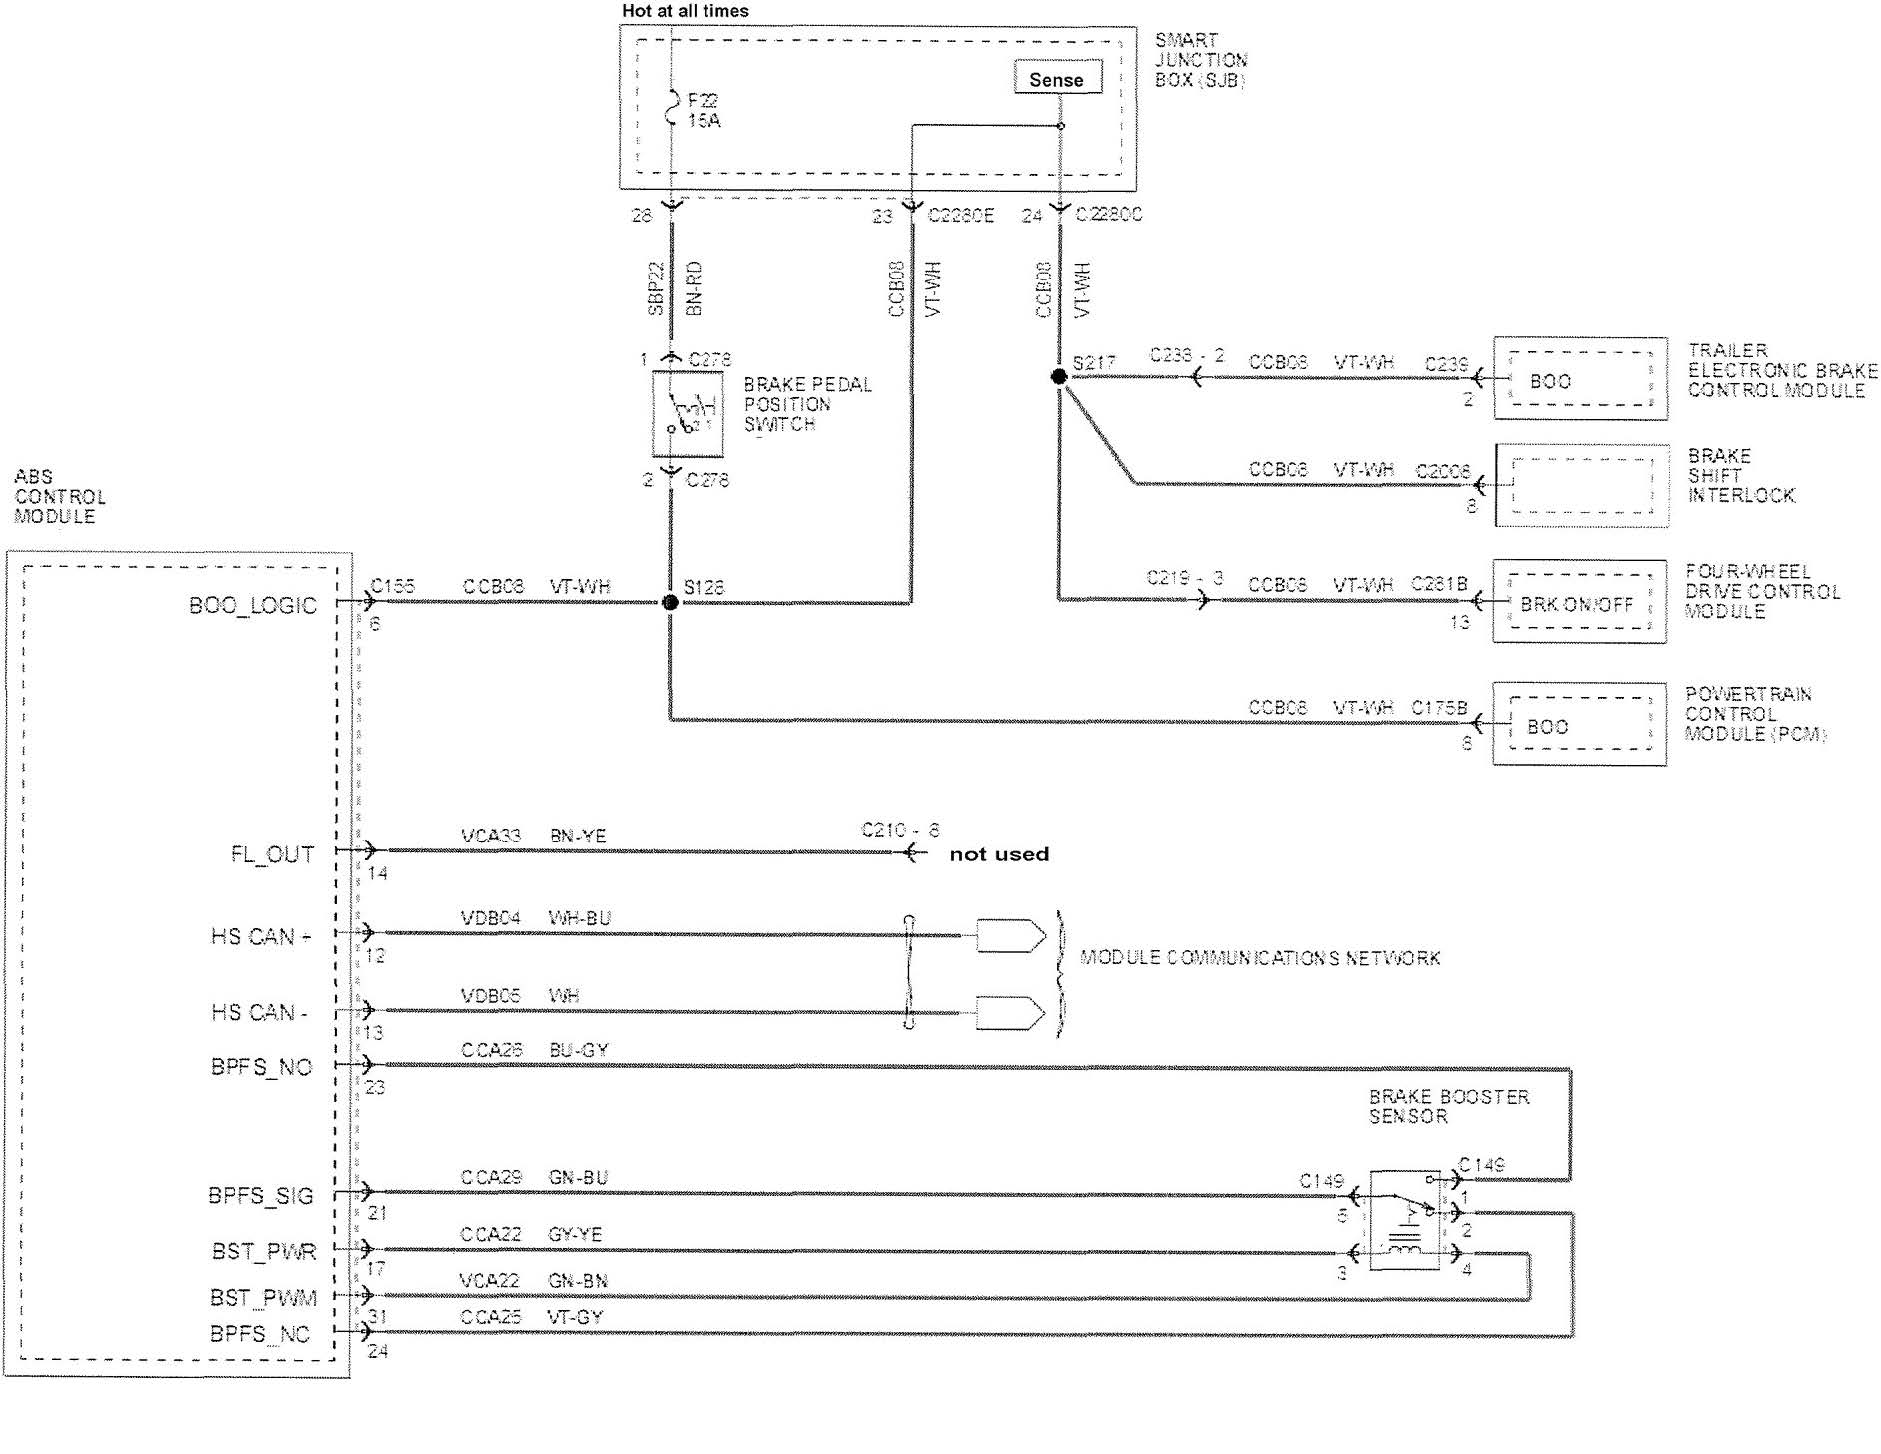 mins ecm wiring diagram 10 ulrich temme de u2022 rh 10 ulrich temme de 2006  equinox ecm wiring diagram cummins m11 ecm wiring diagram